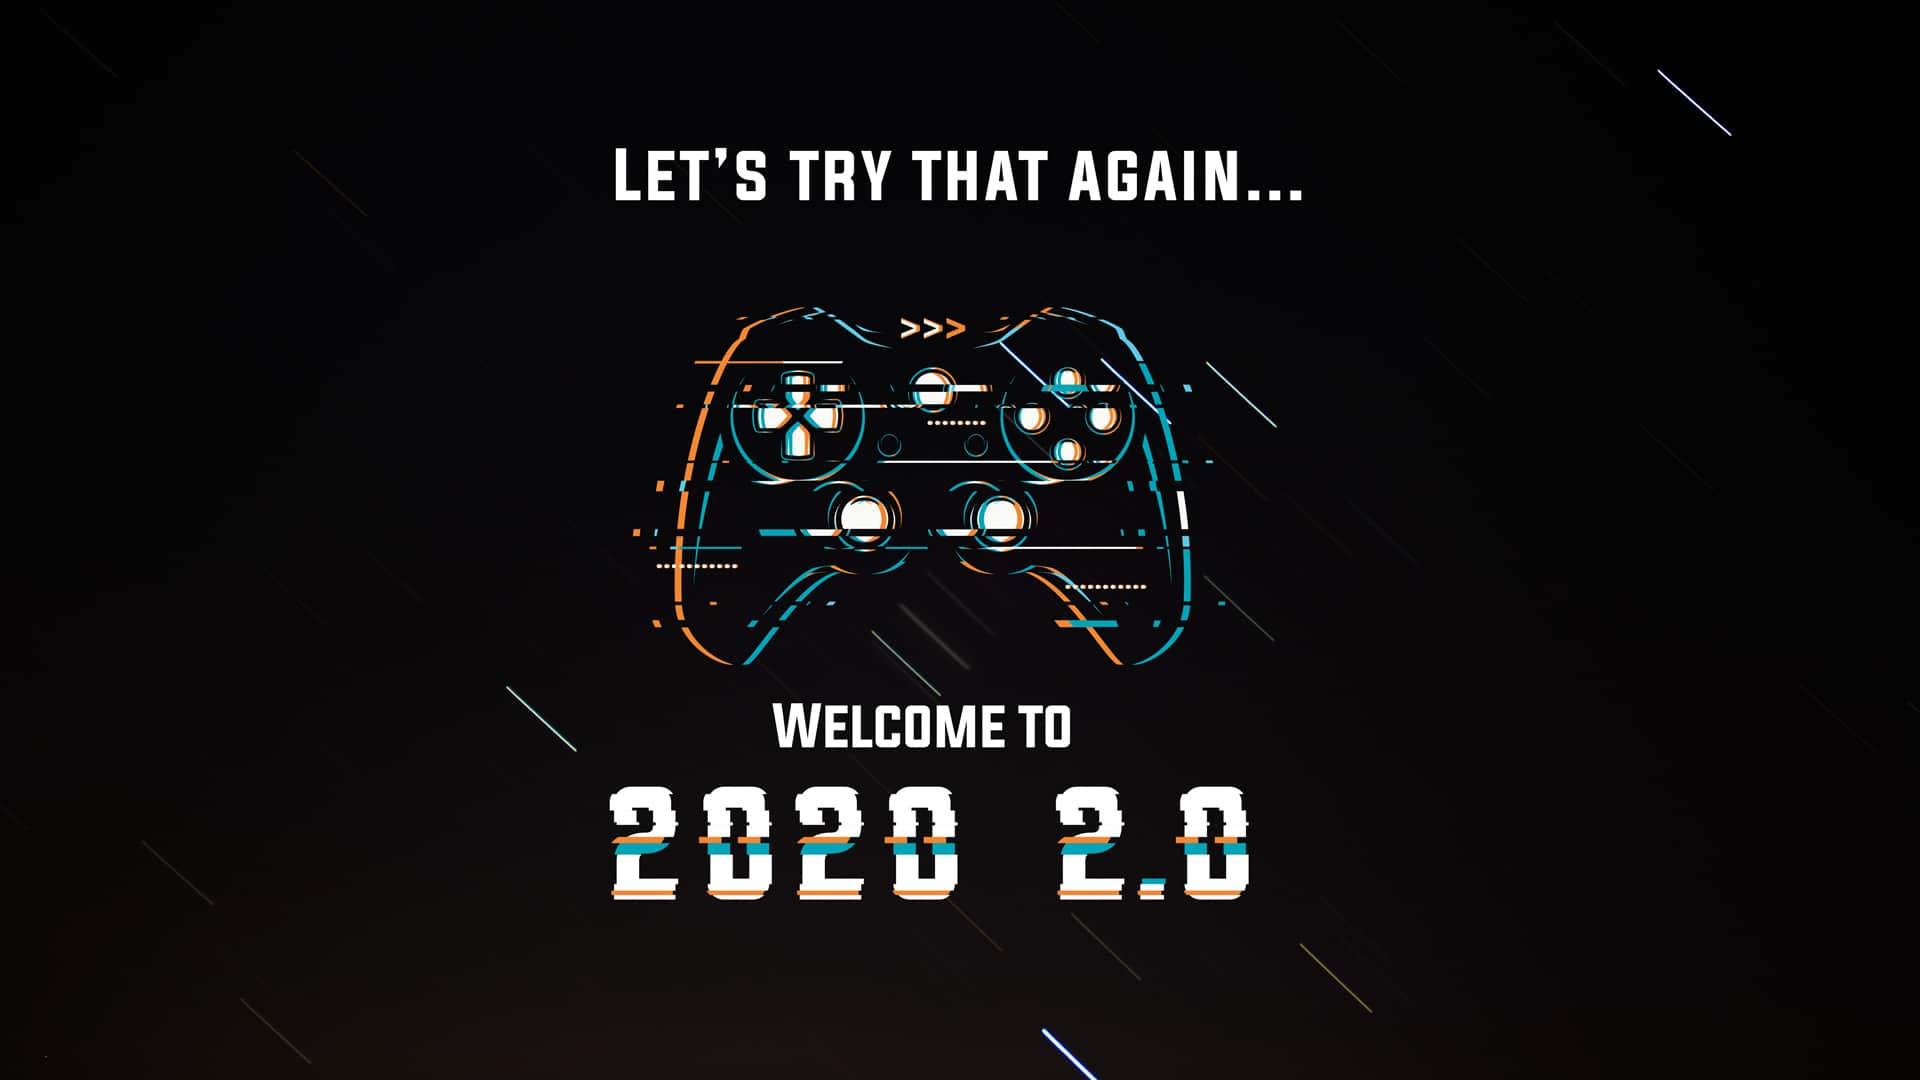 January 2021 wallpaper desktop